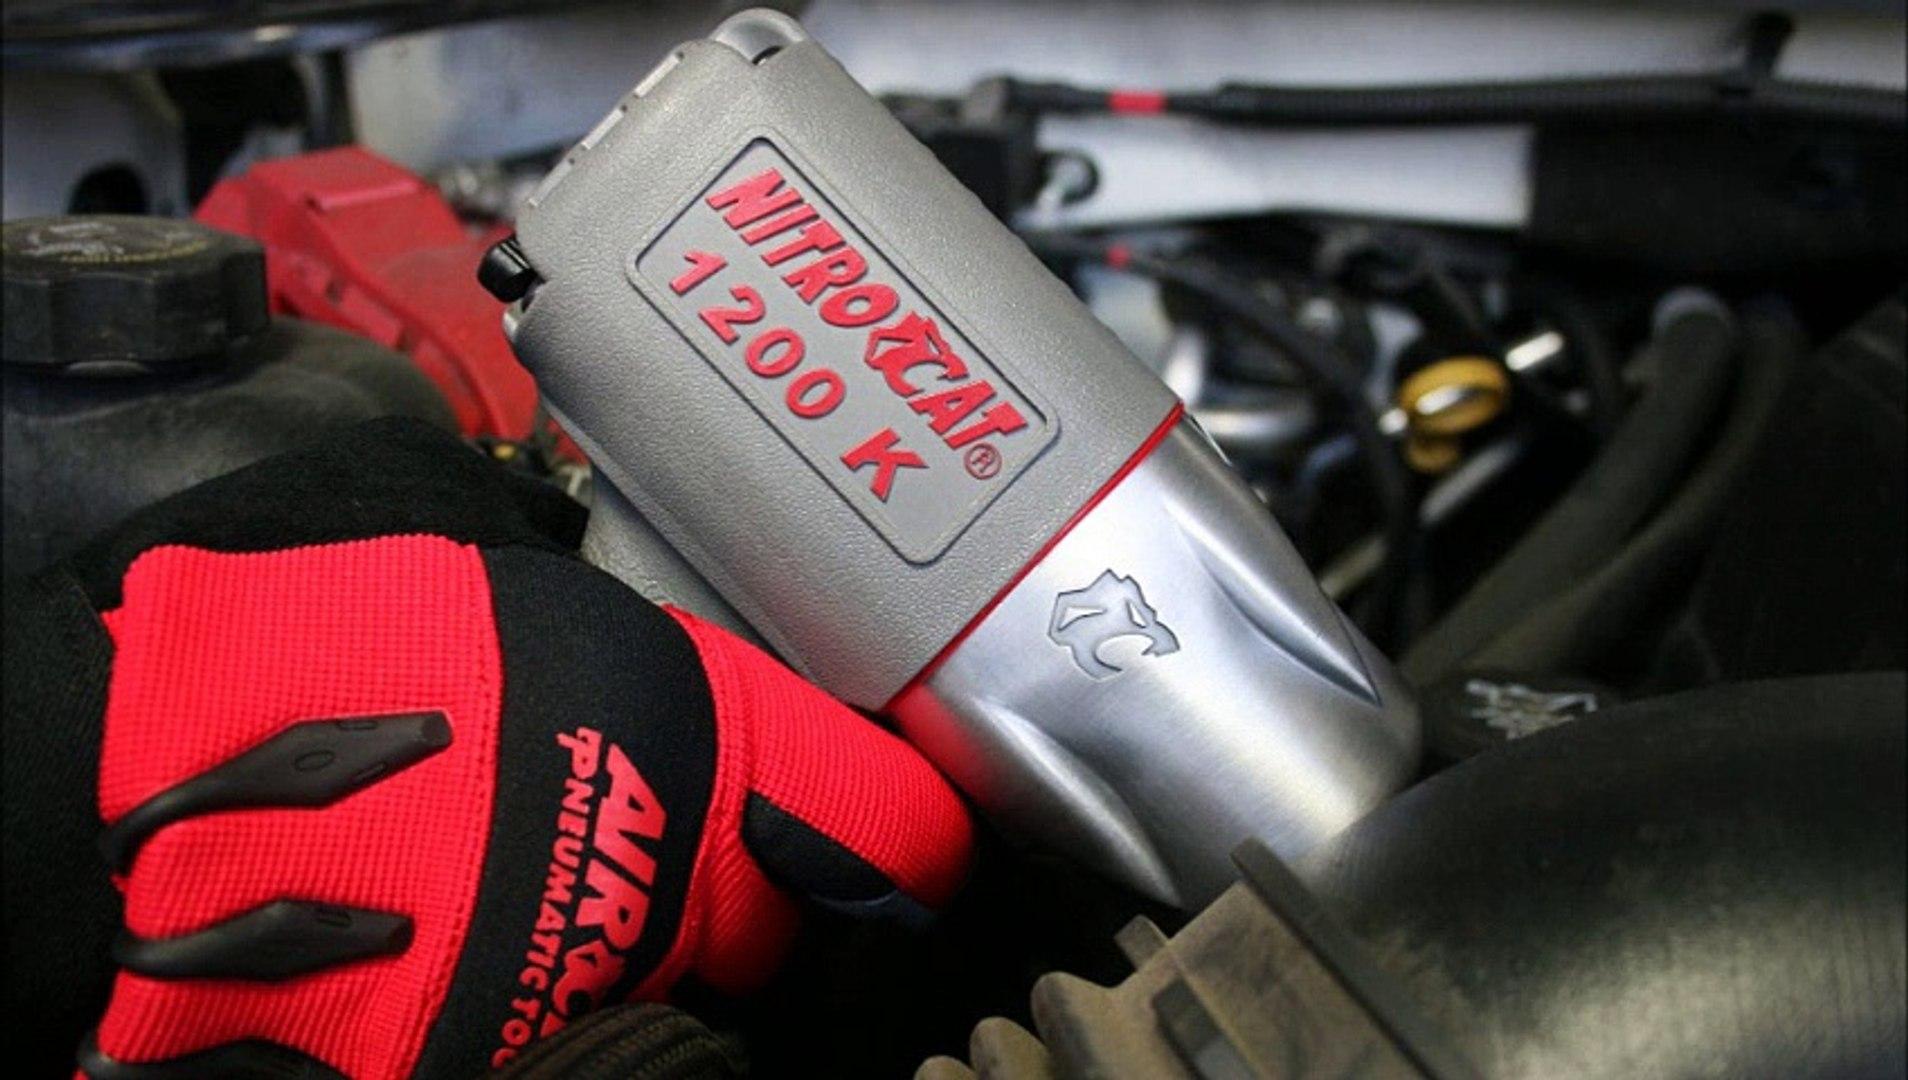 Nitrocat 1250k vs 1200k Air Impact Wrench